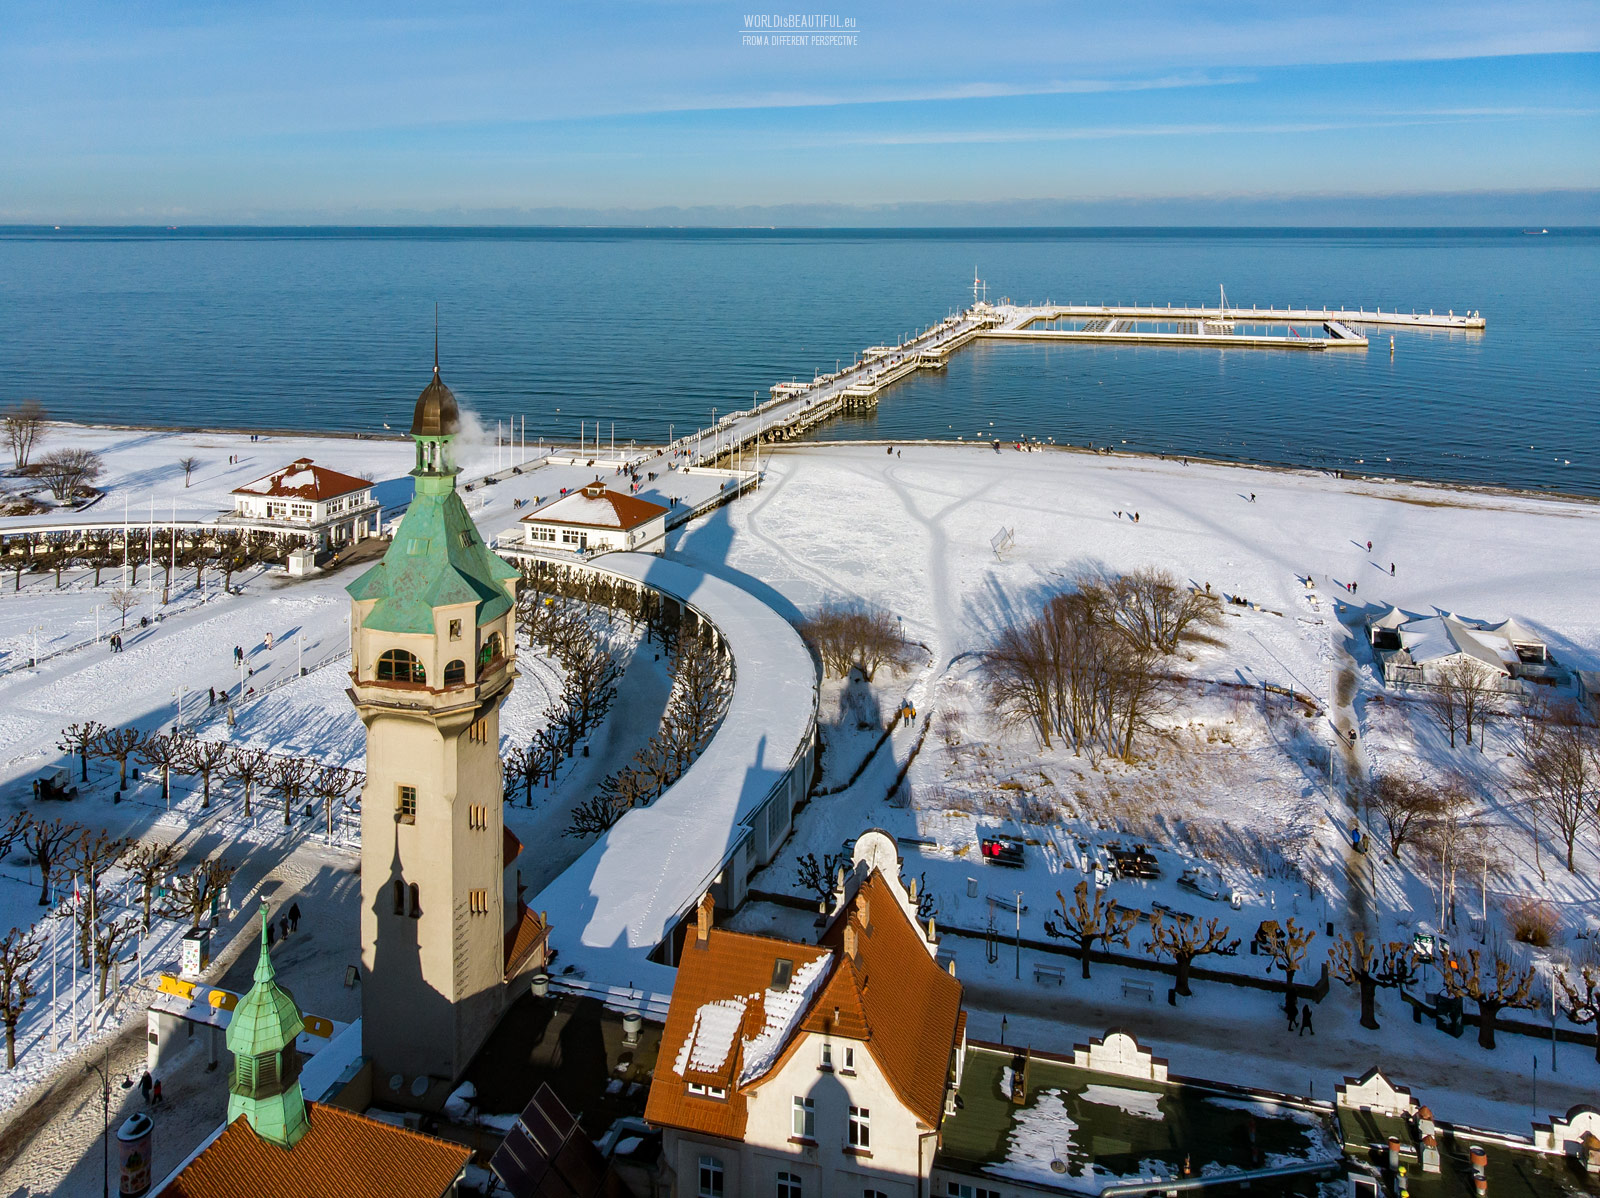 Zimowy Sopot